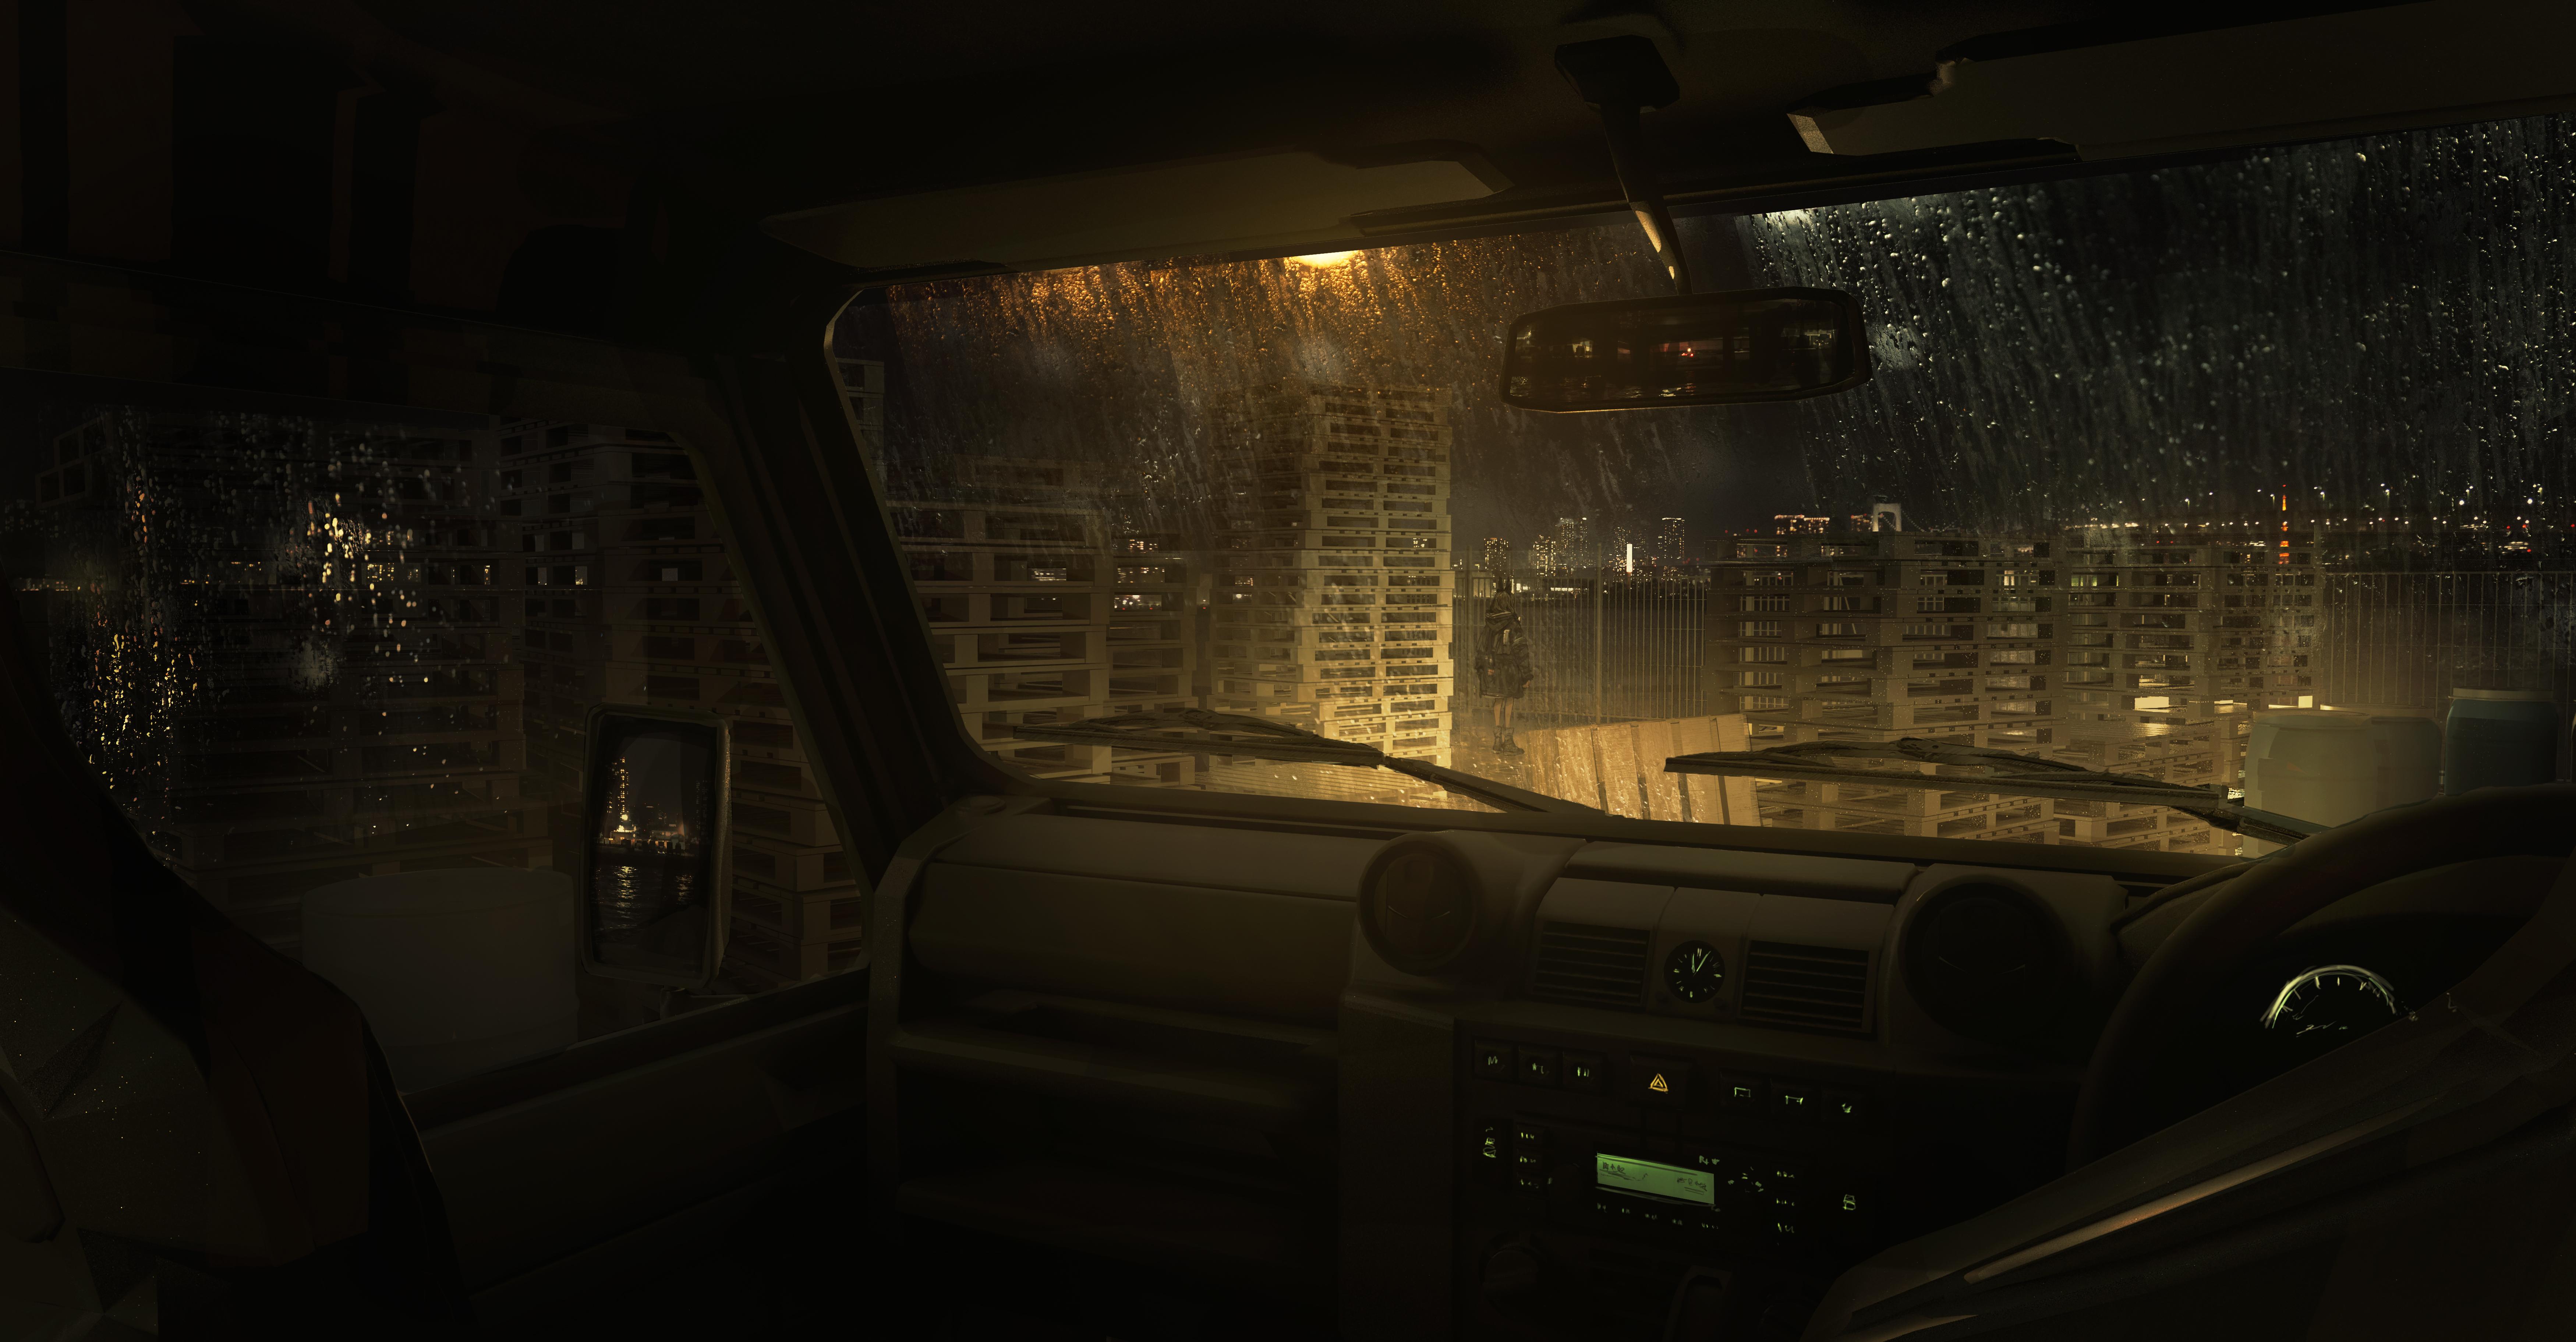 Anime 7000x3646 car inside a car rain reflection city city lights standing _LM7_